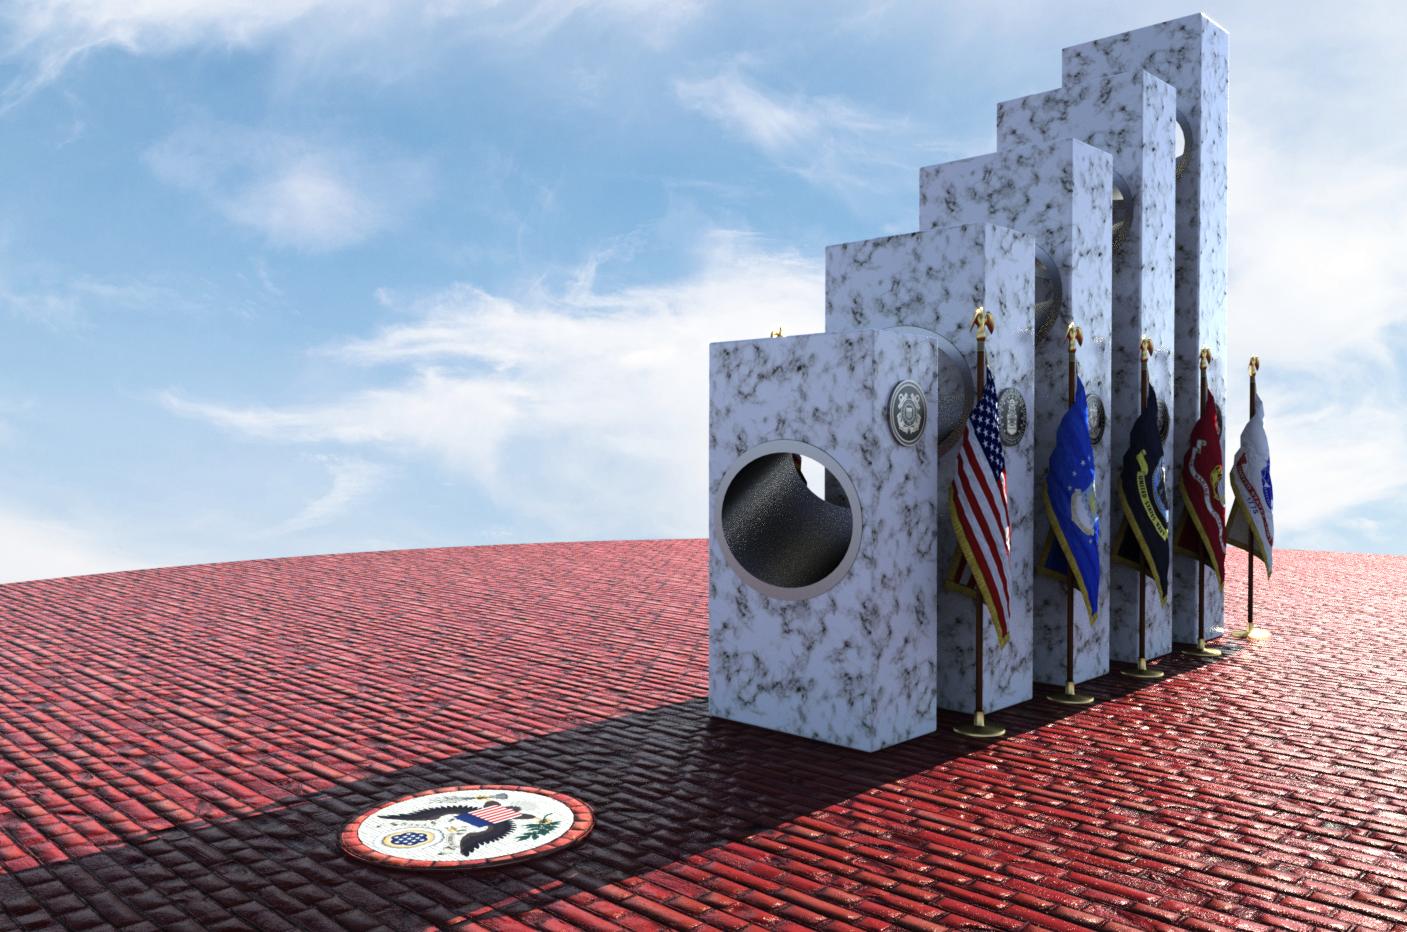 Athem Veterans Memorial in Anthem, Arizona